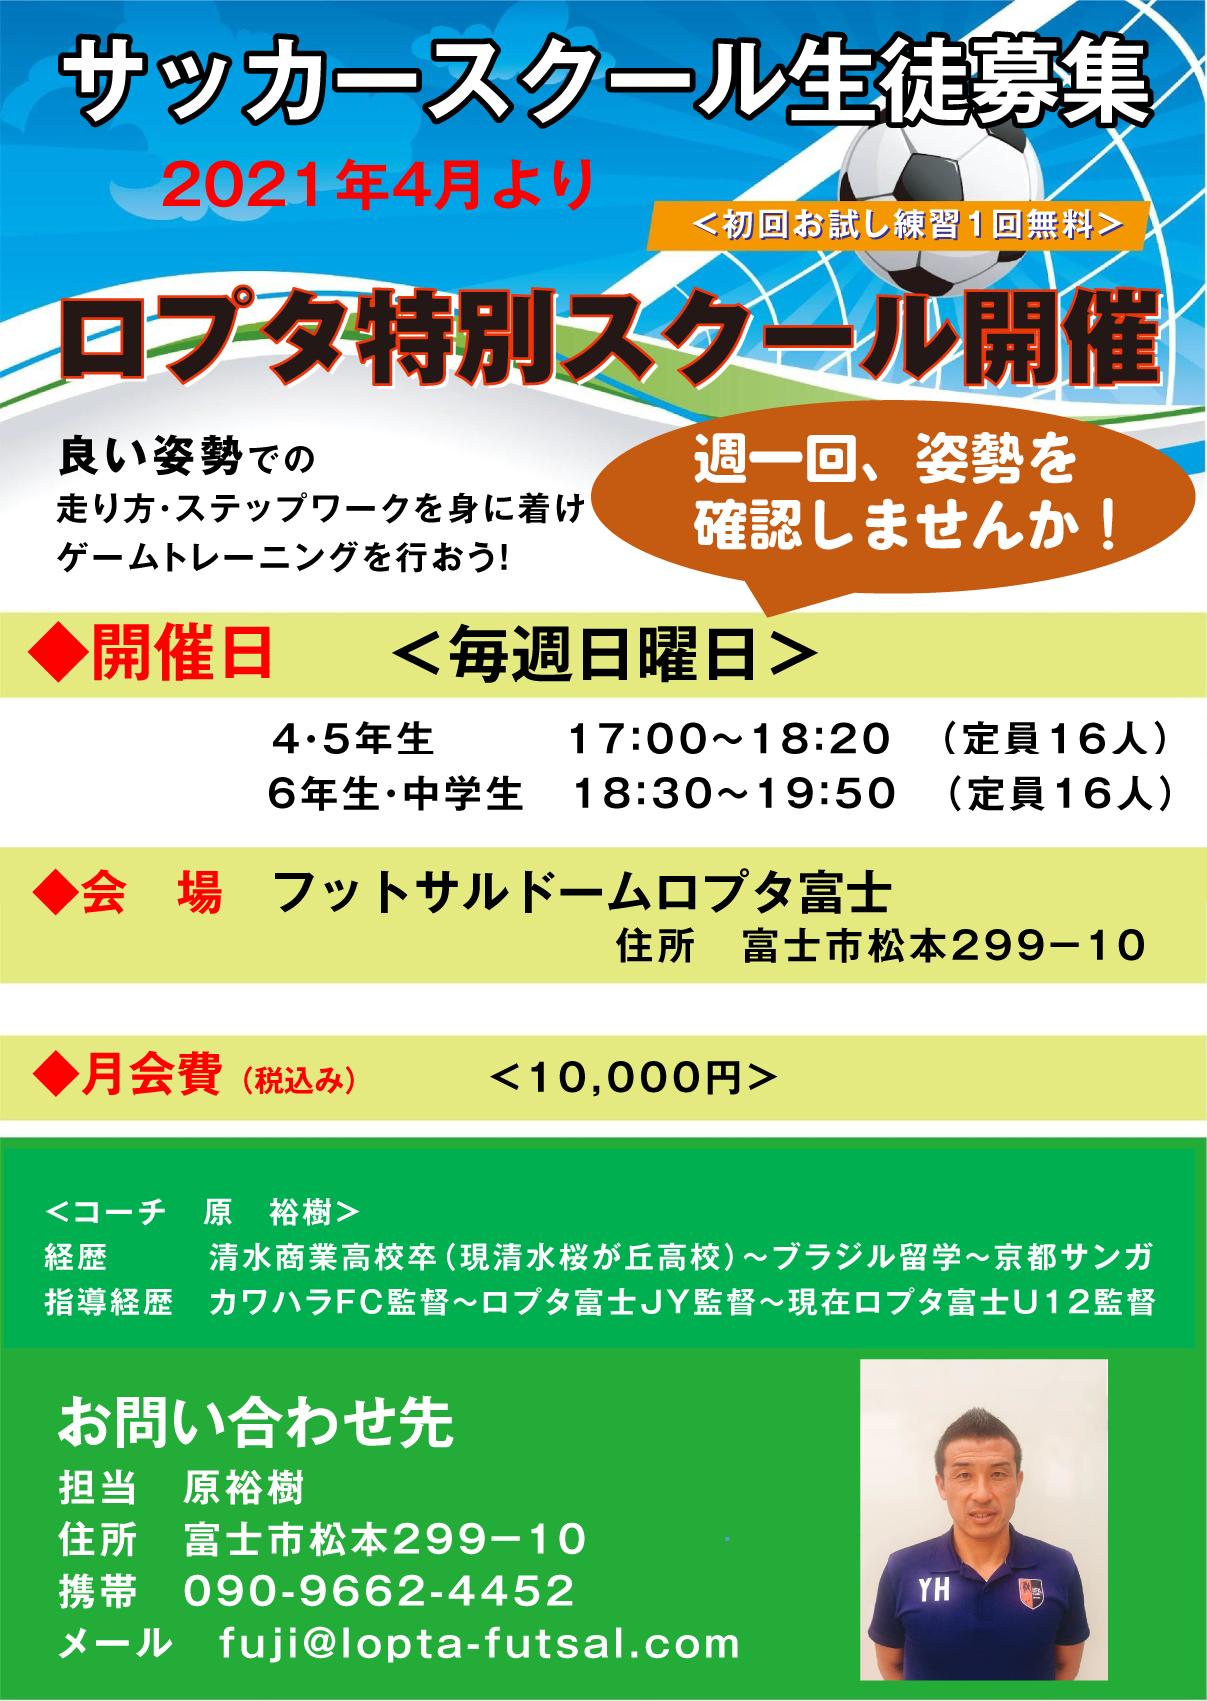 tokubetsu2021.png